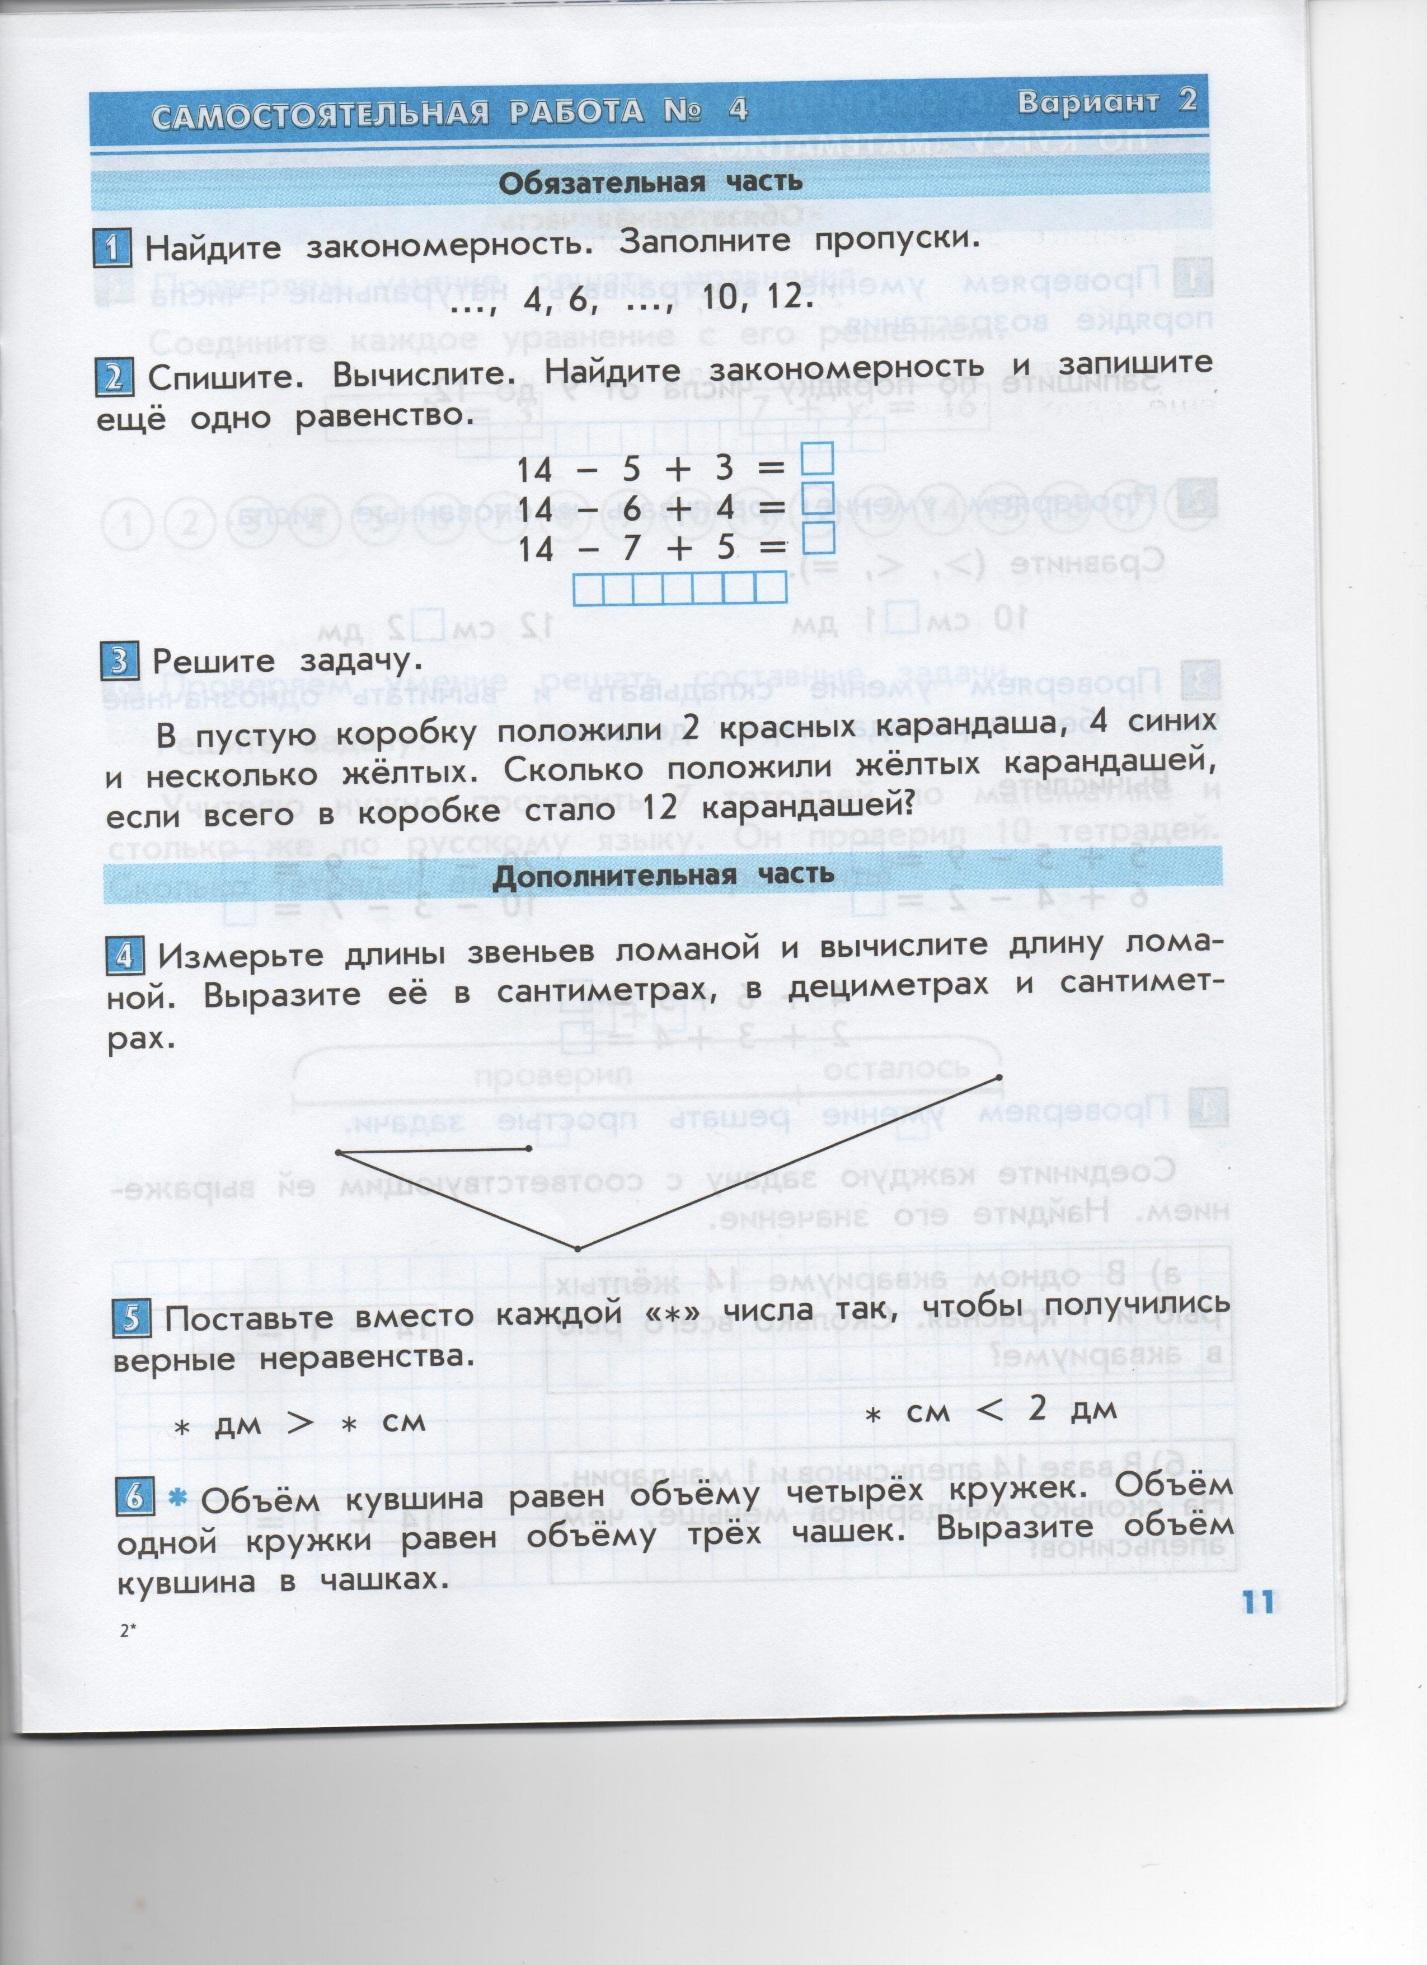 F:\Самост. по МАТЕМ. И окр.миру (СКАНЕР)\Математика\1 014.jpg